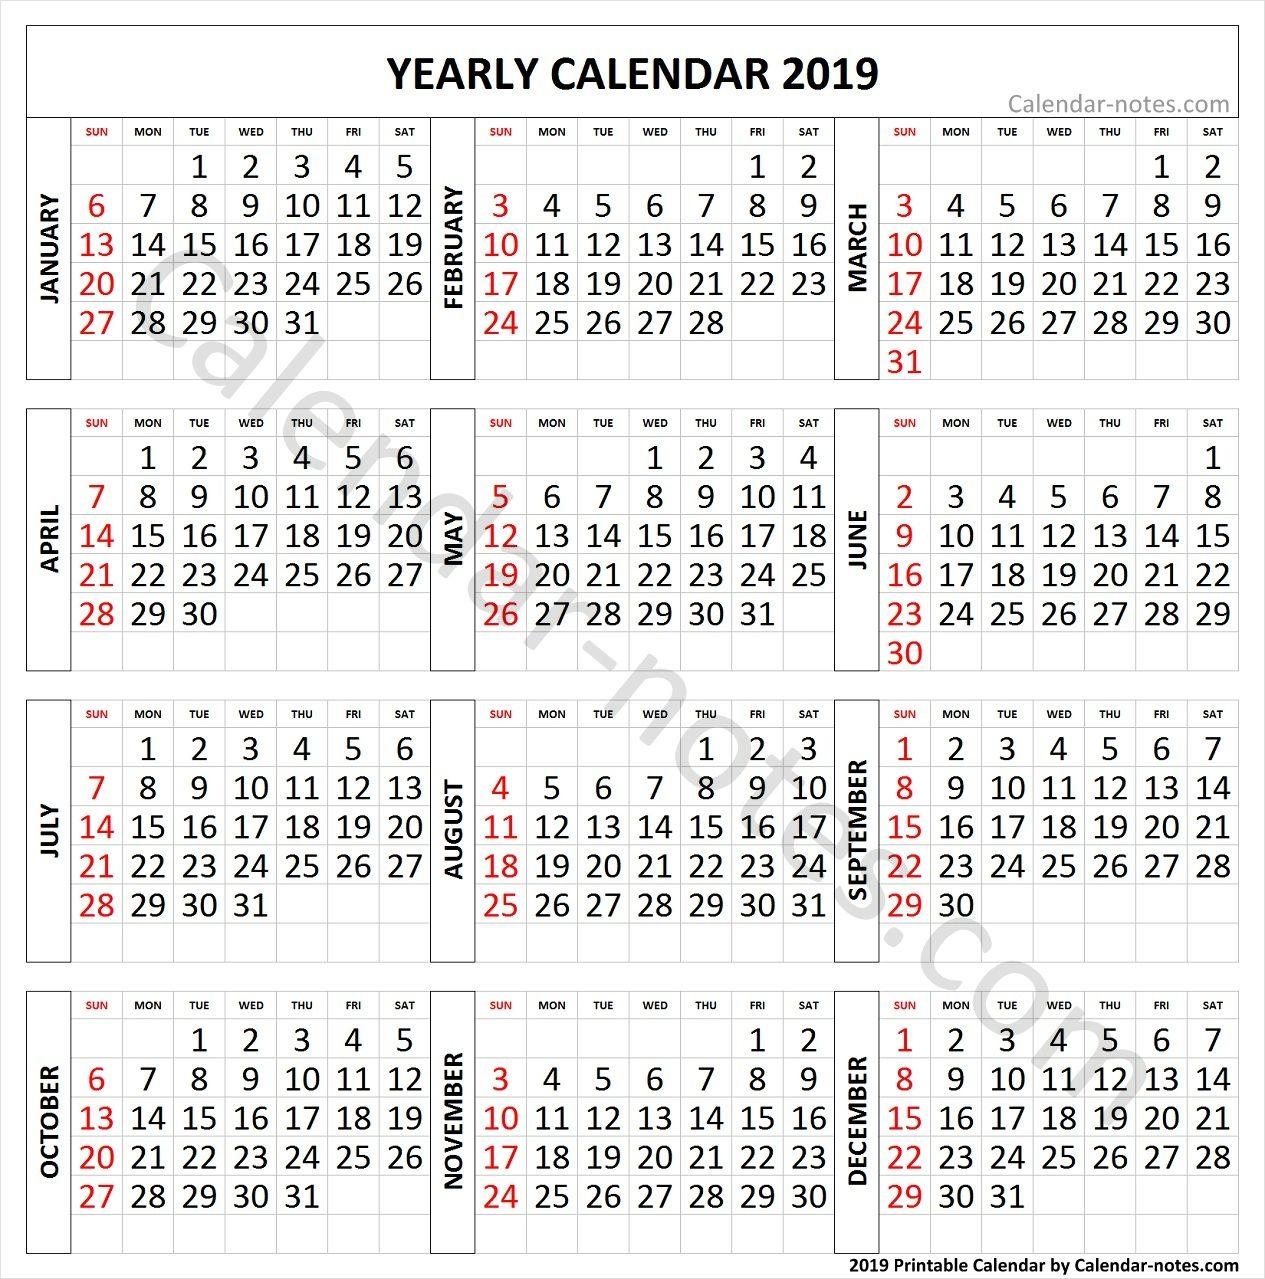 2019 Calendar Large Numbers Yearly Calendar 2019 Pinterest